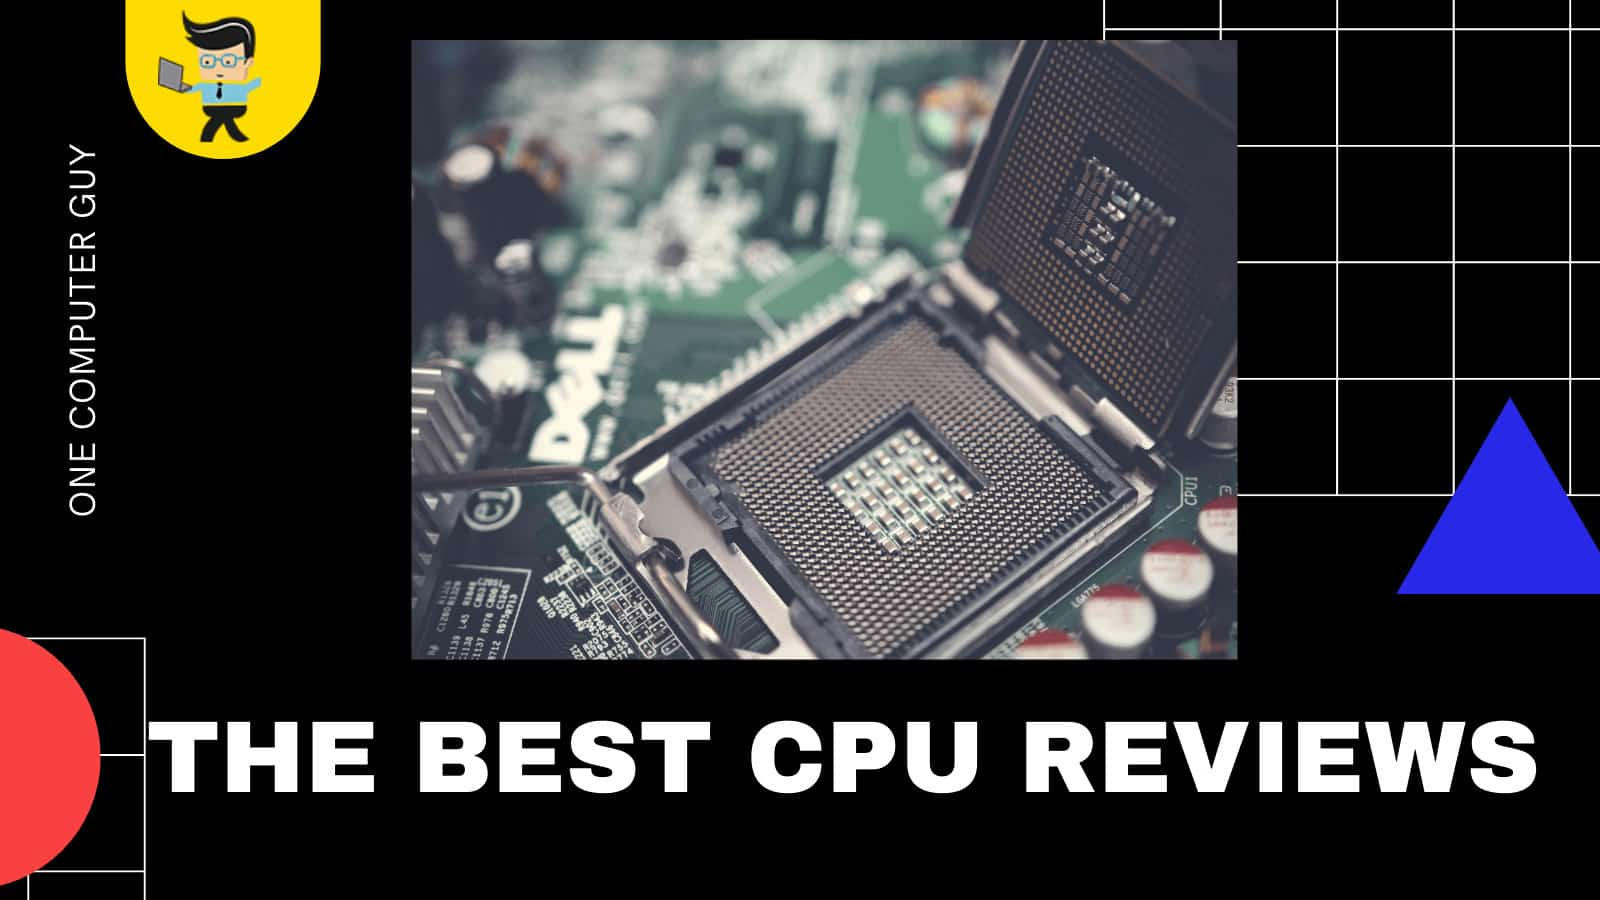 Cpu reviews